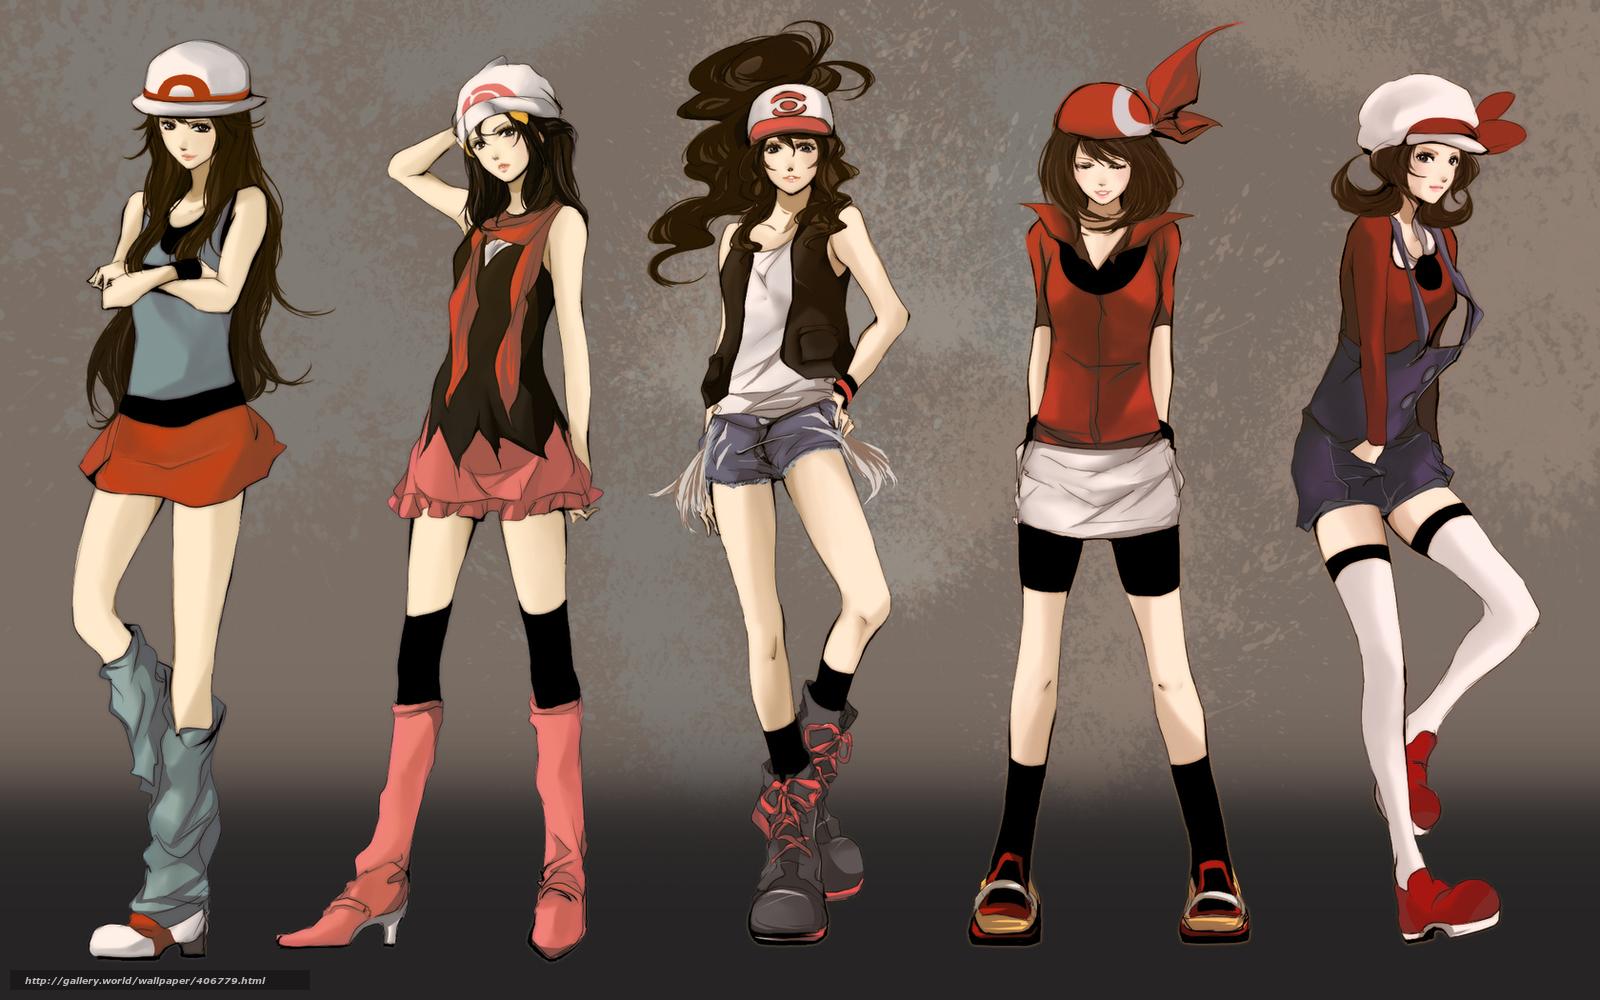 Tlcharger Fond D Ecran Anime Fille Pokemon Style Fonds